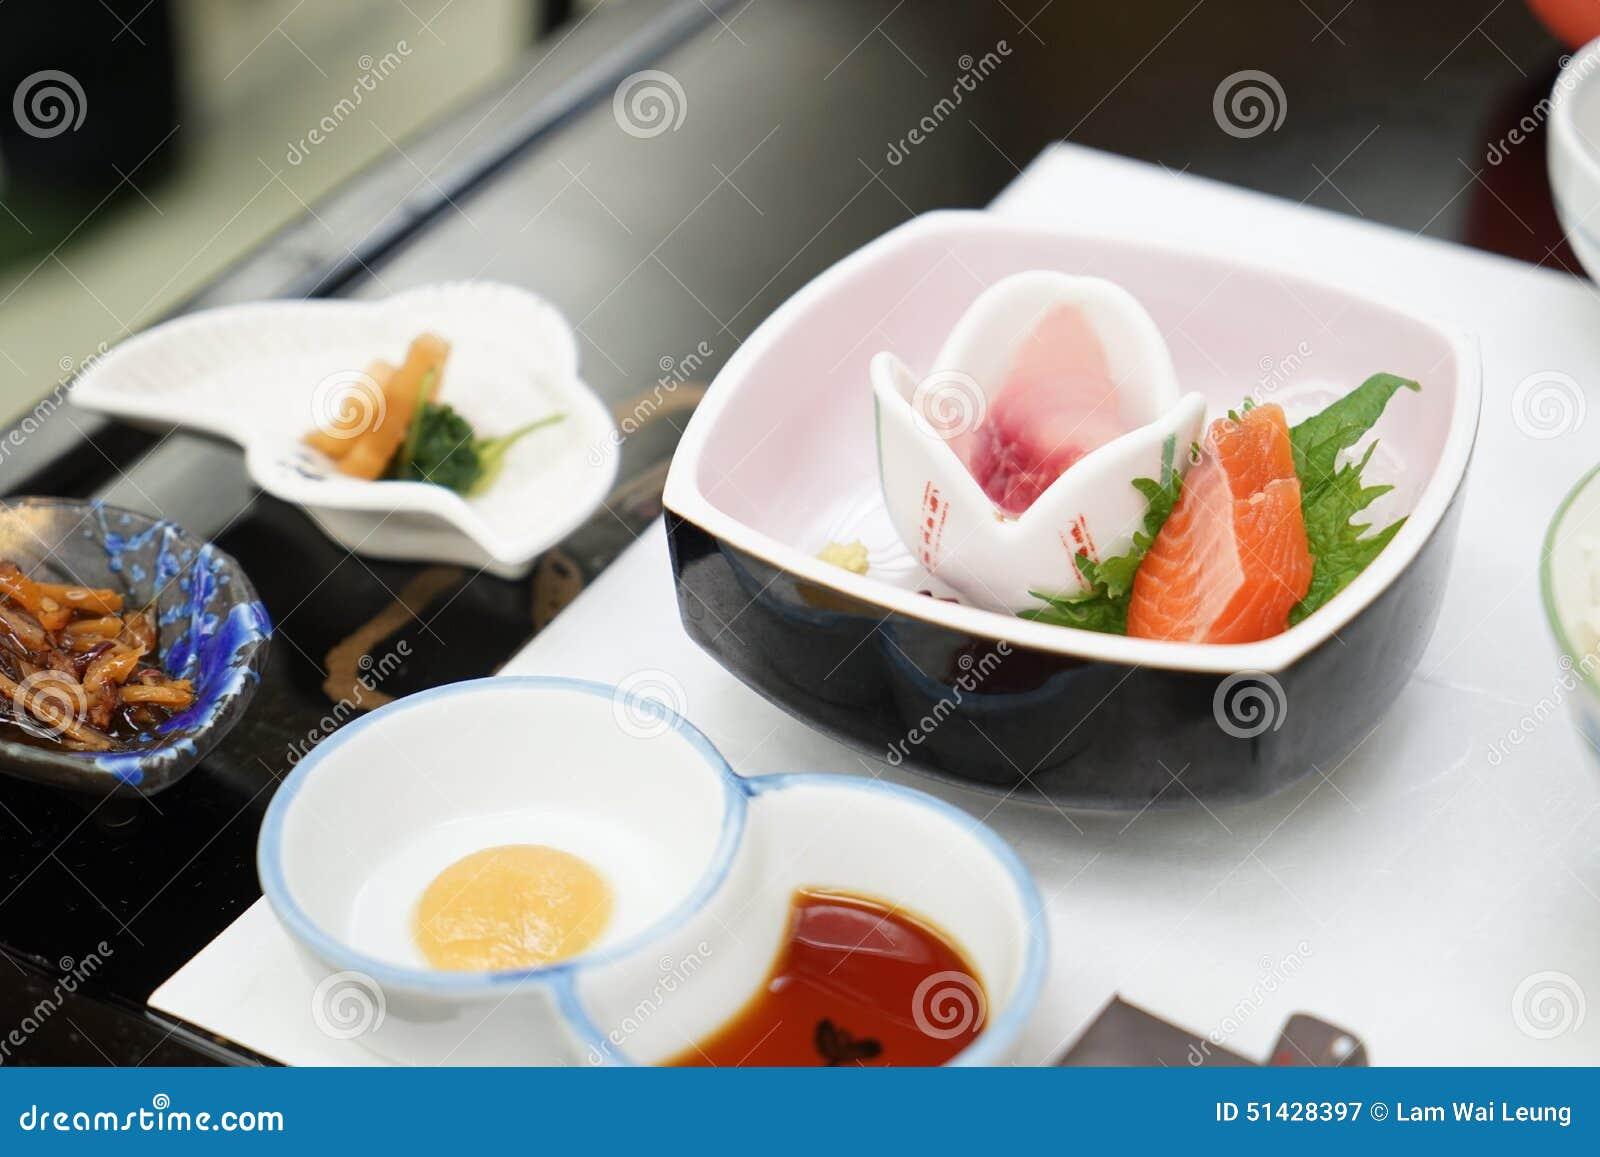 sushi beautiful fish food - photo #2